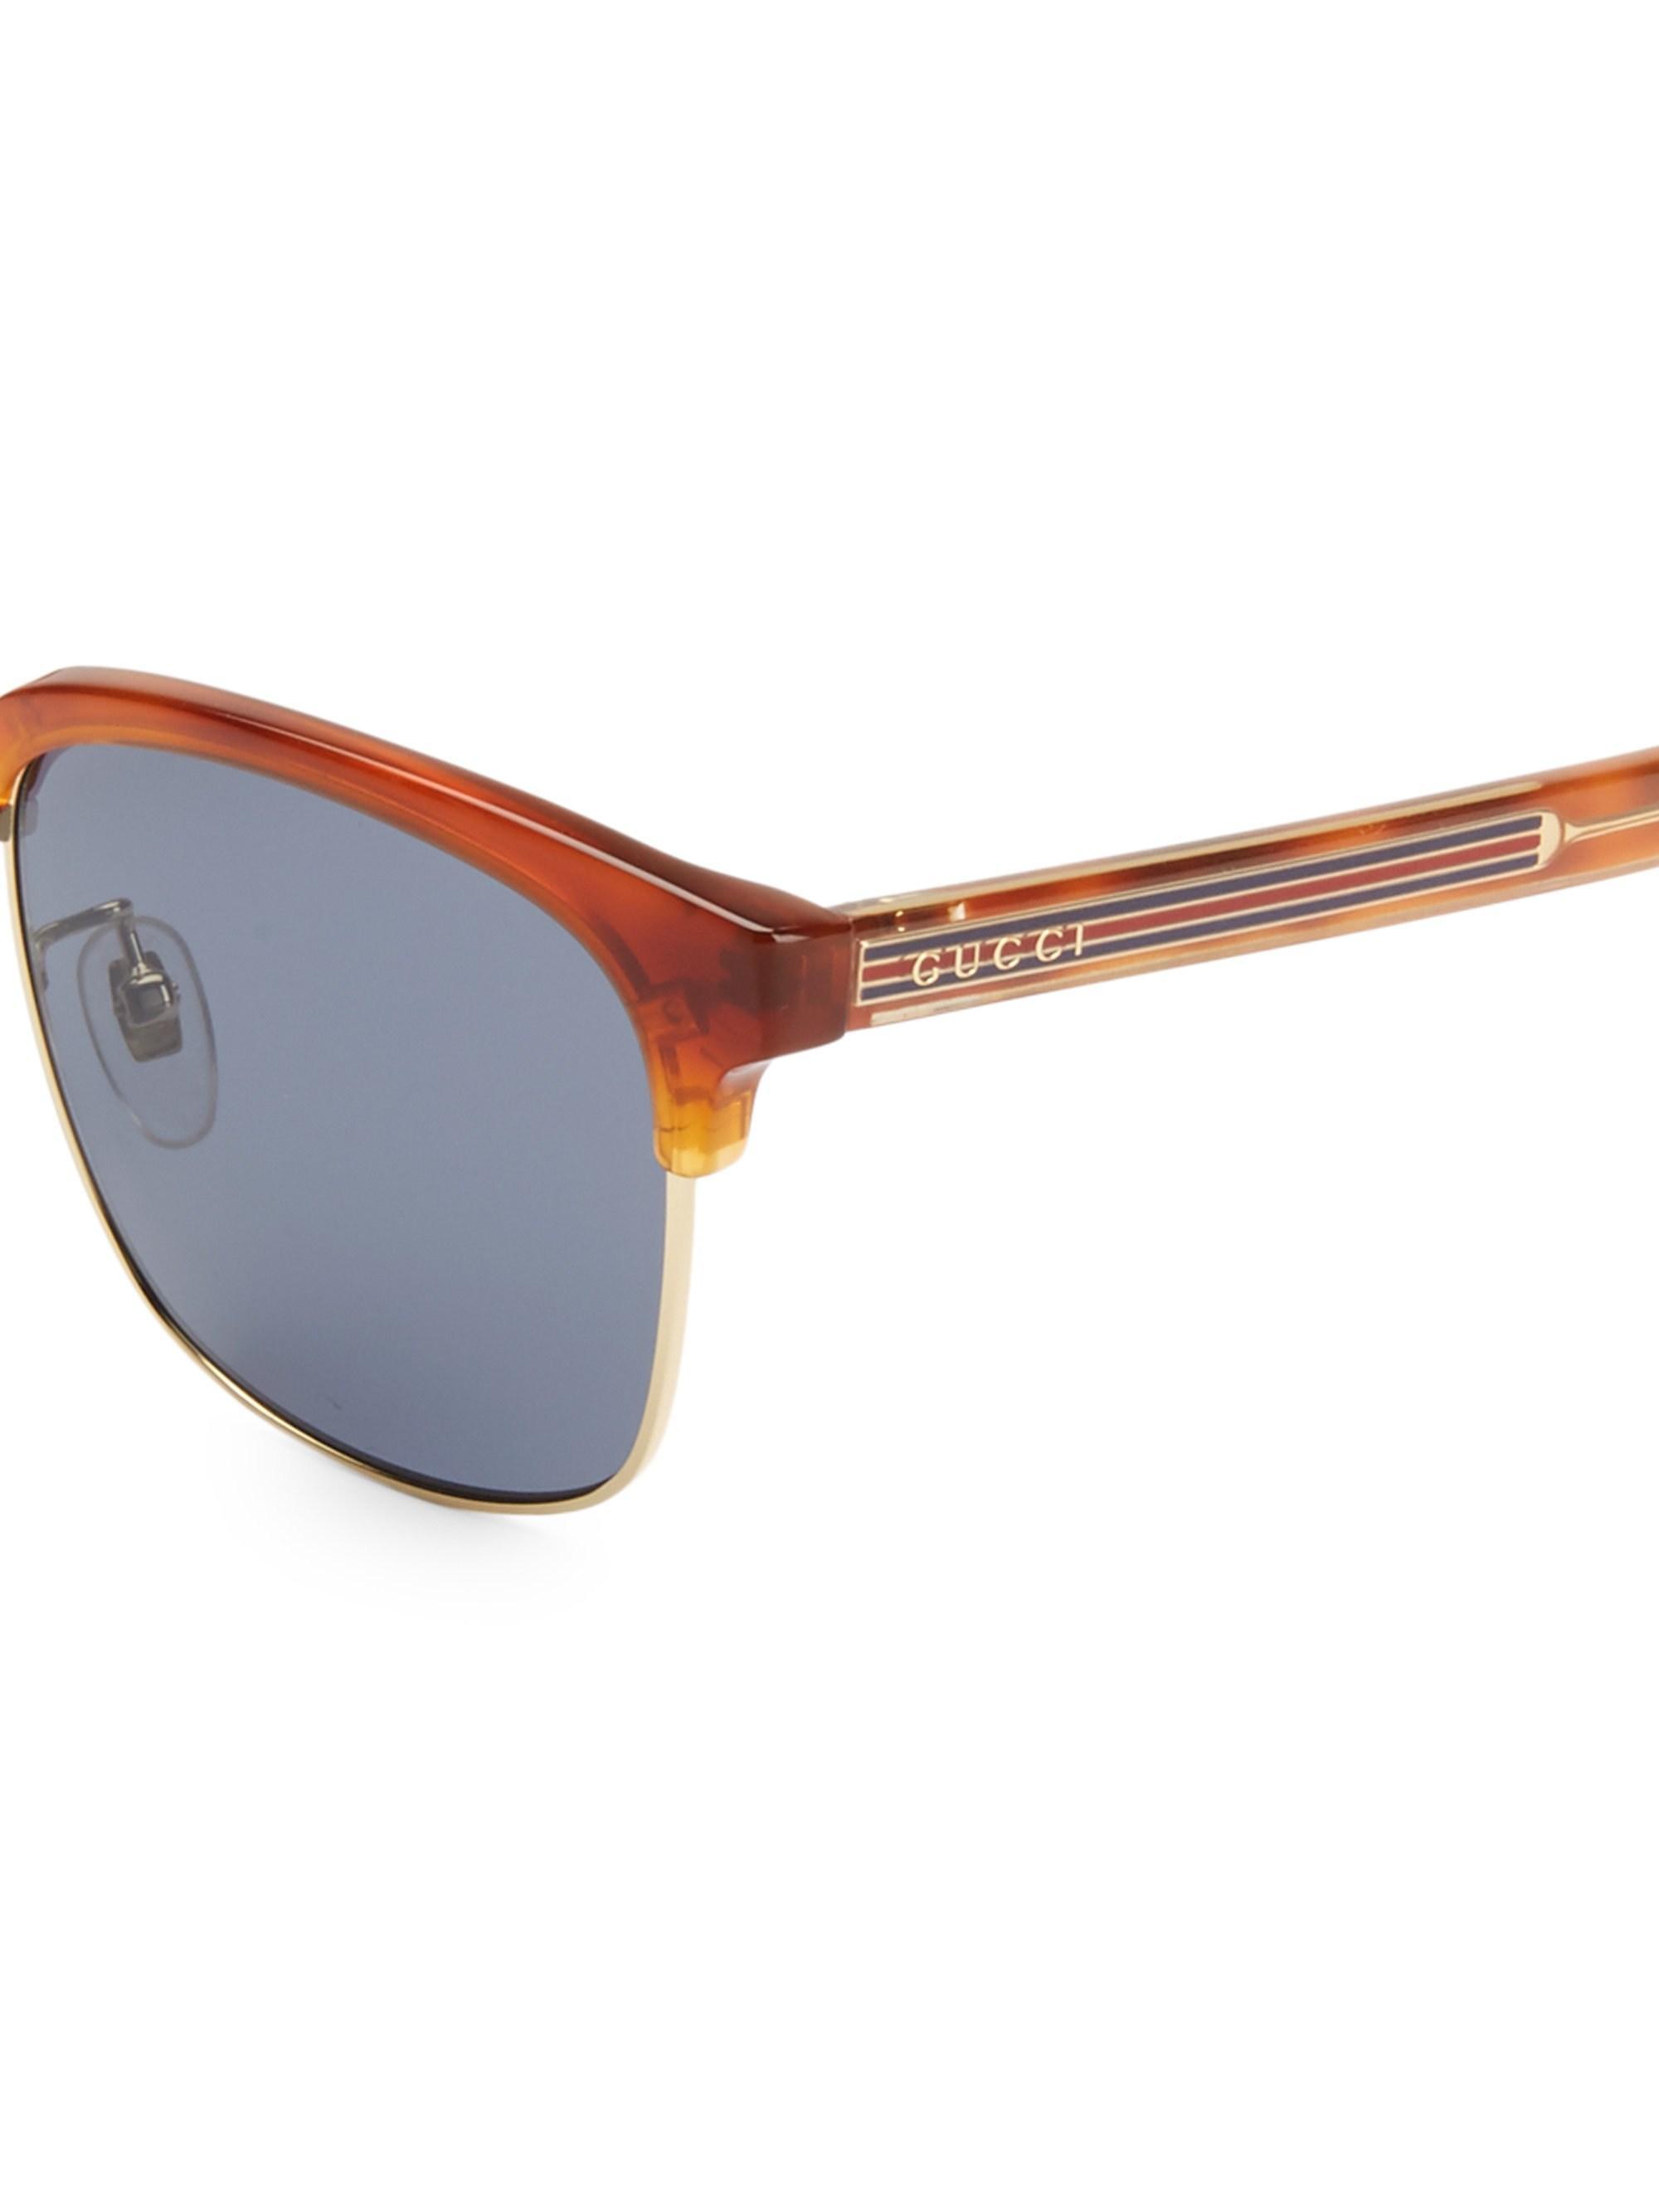 34c6dc9e15 Gucci Men s 56mm Round Havana Sunglasses - Havana in Blue for Men - Lyst